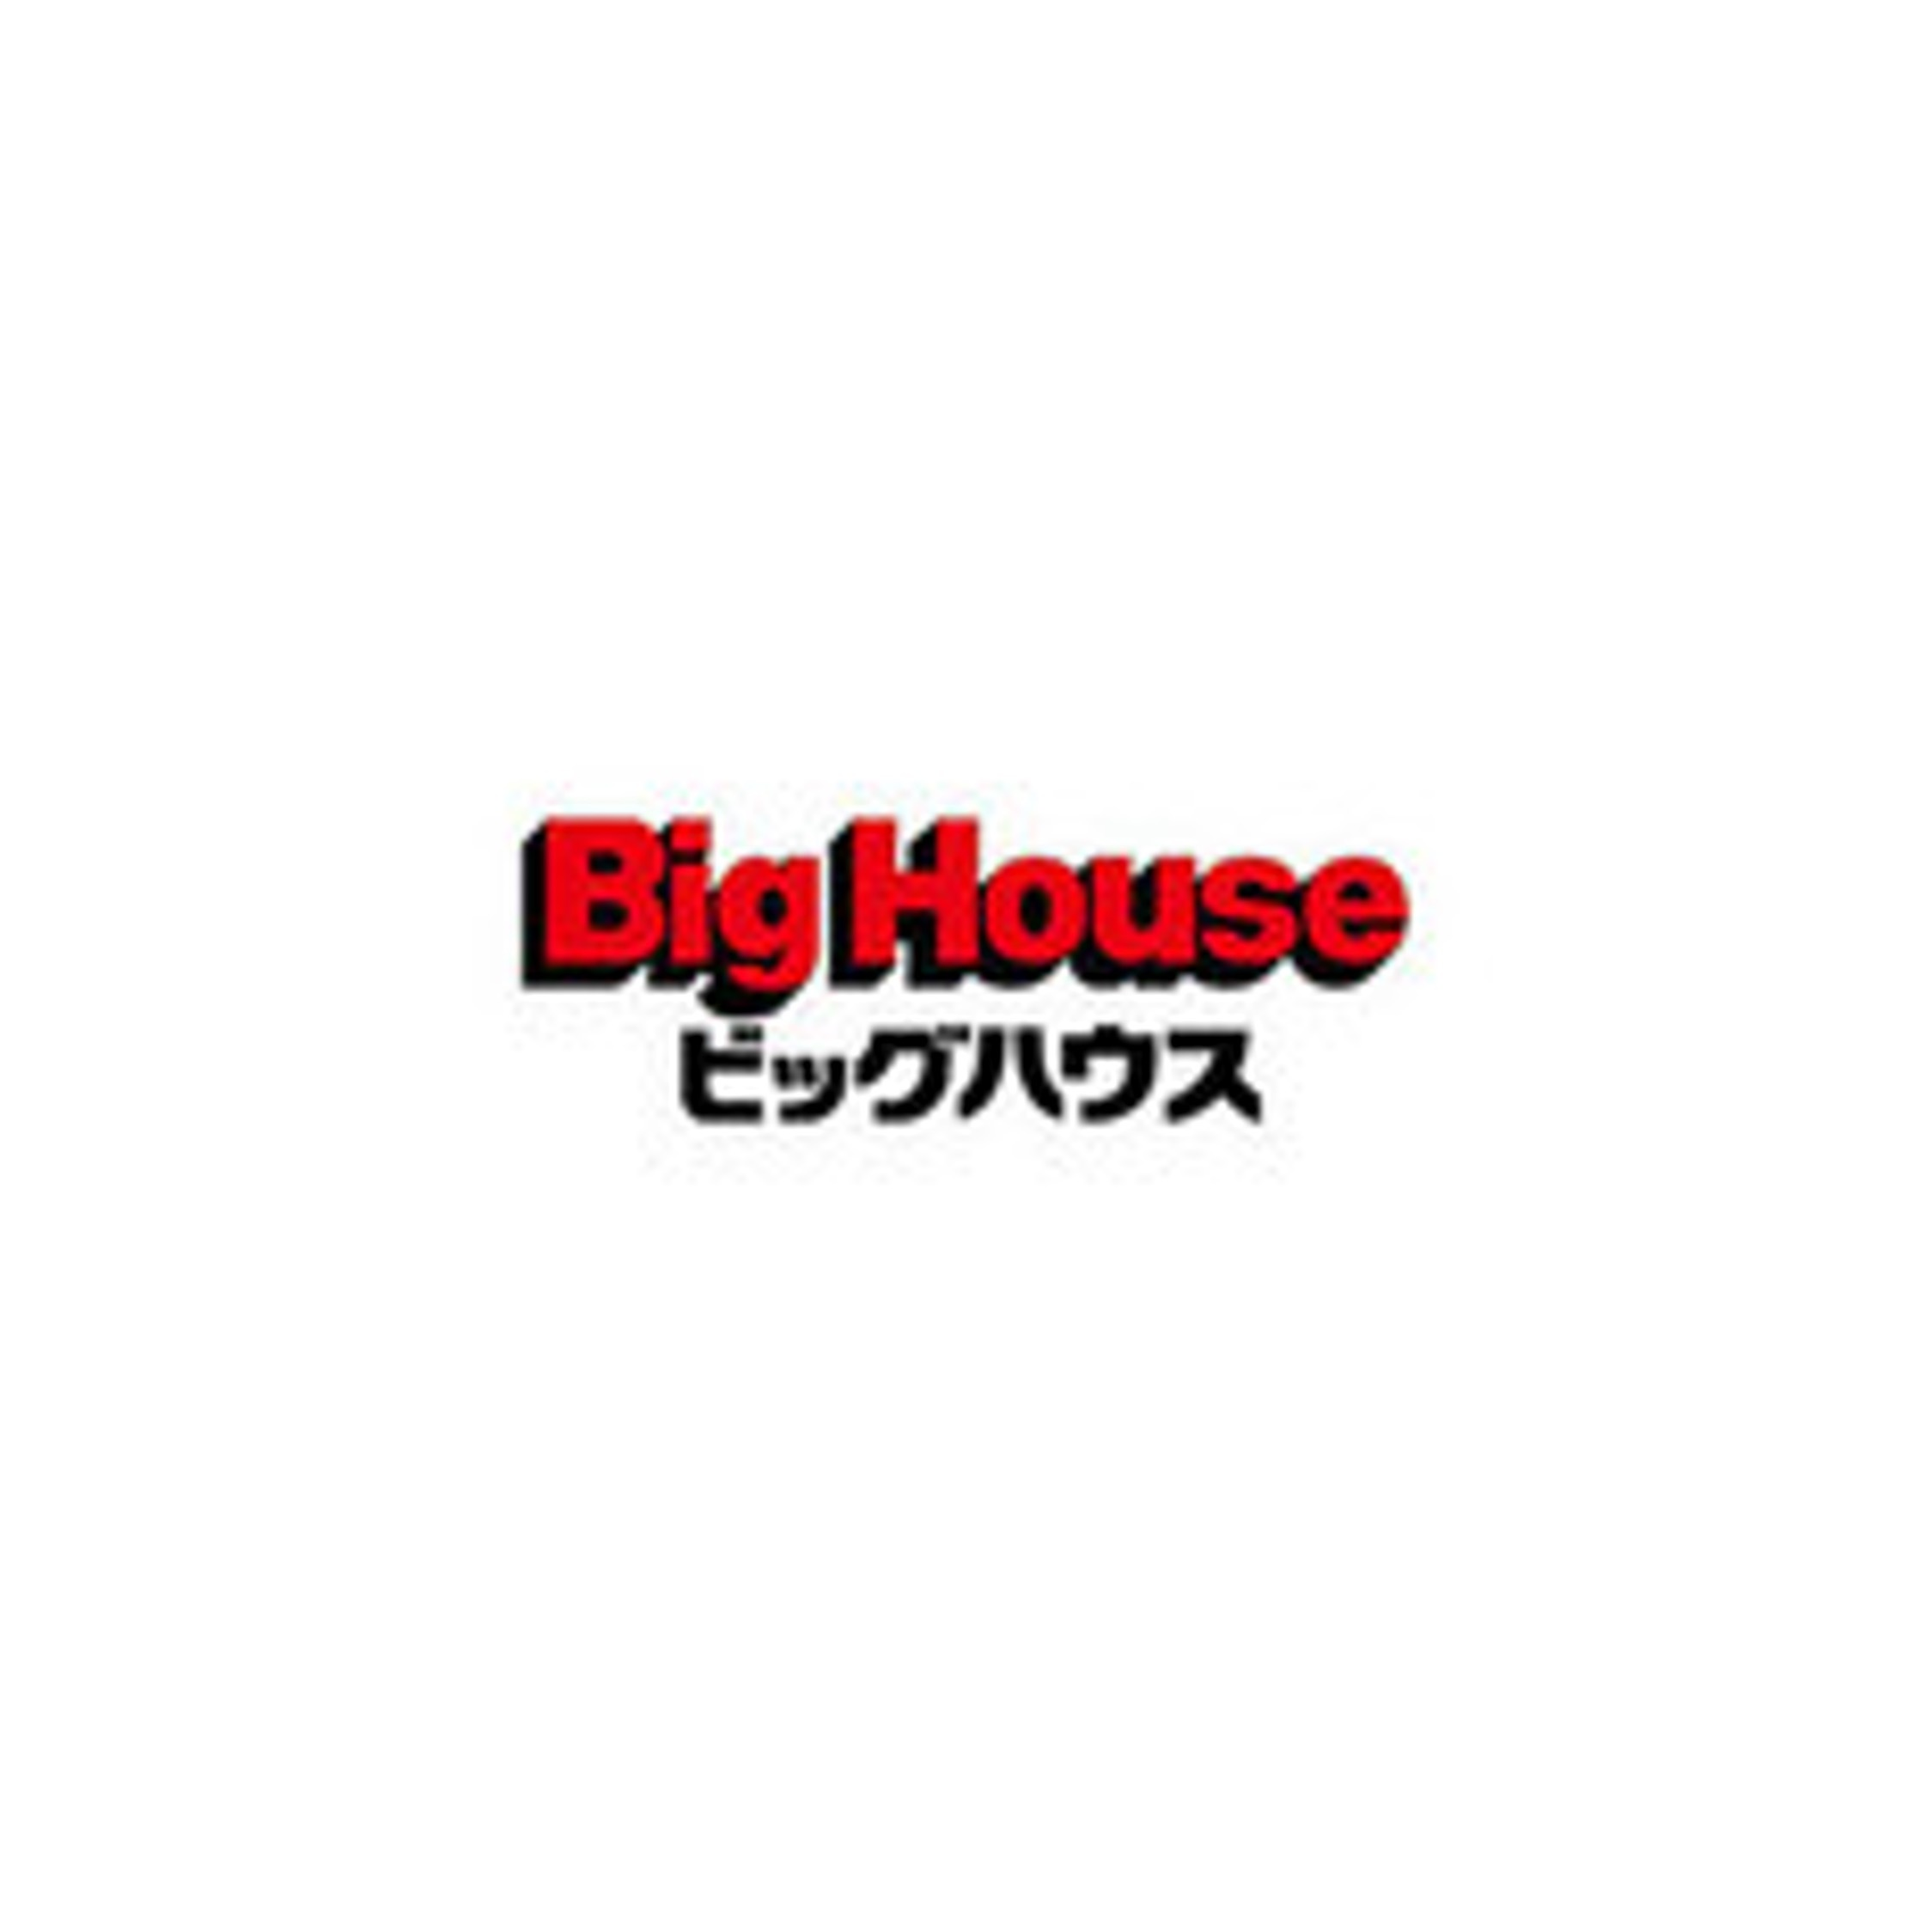 Logo bighouse